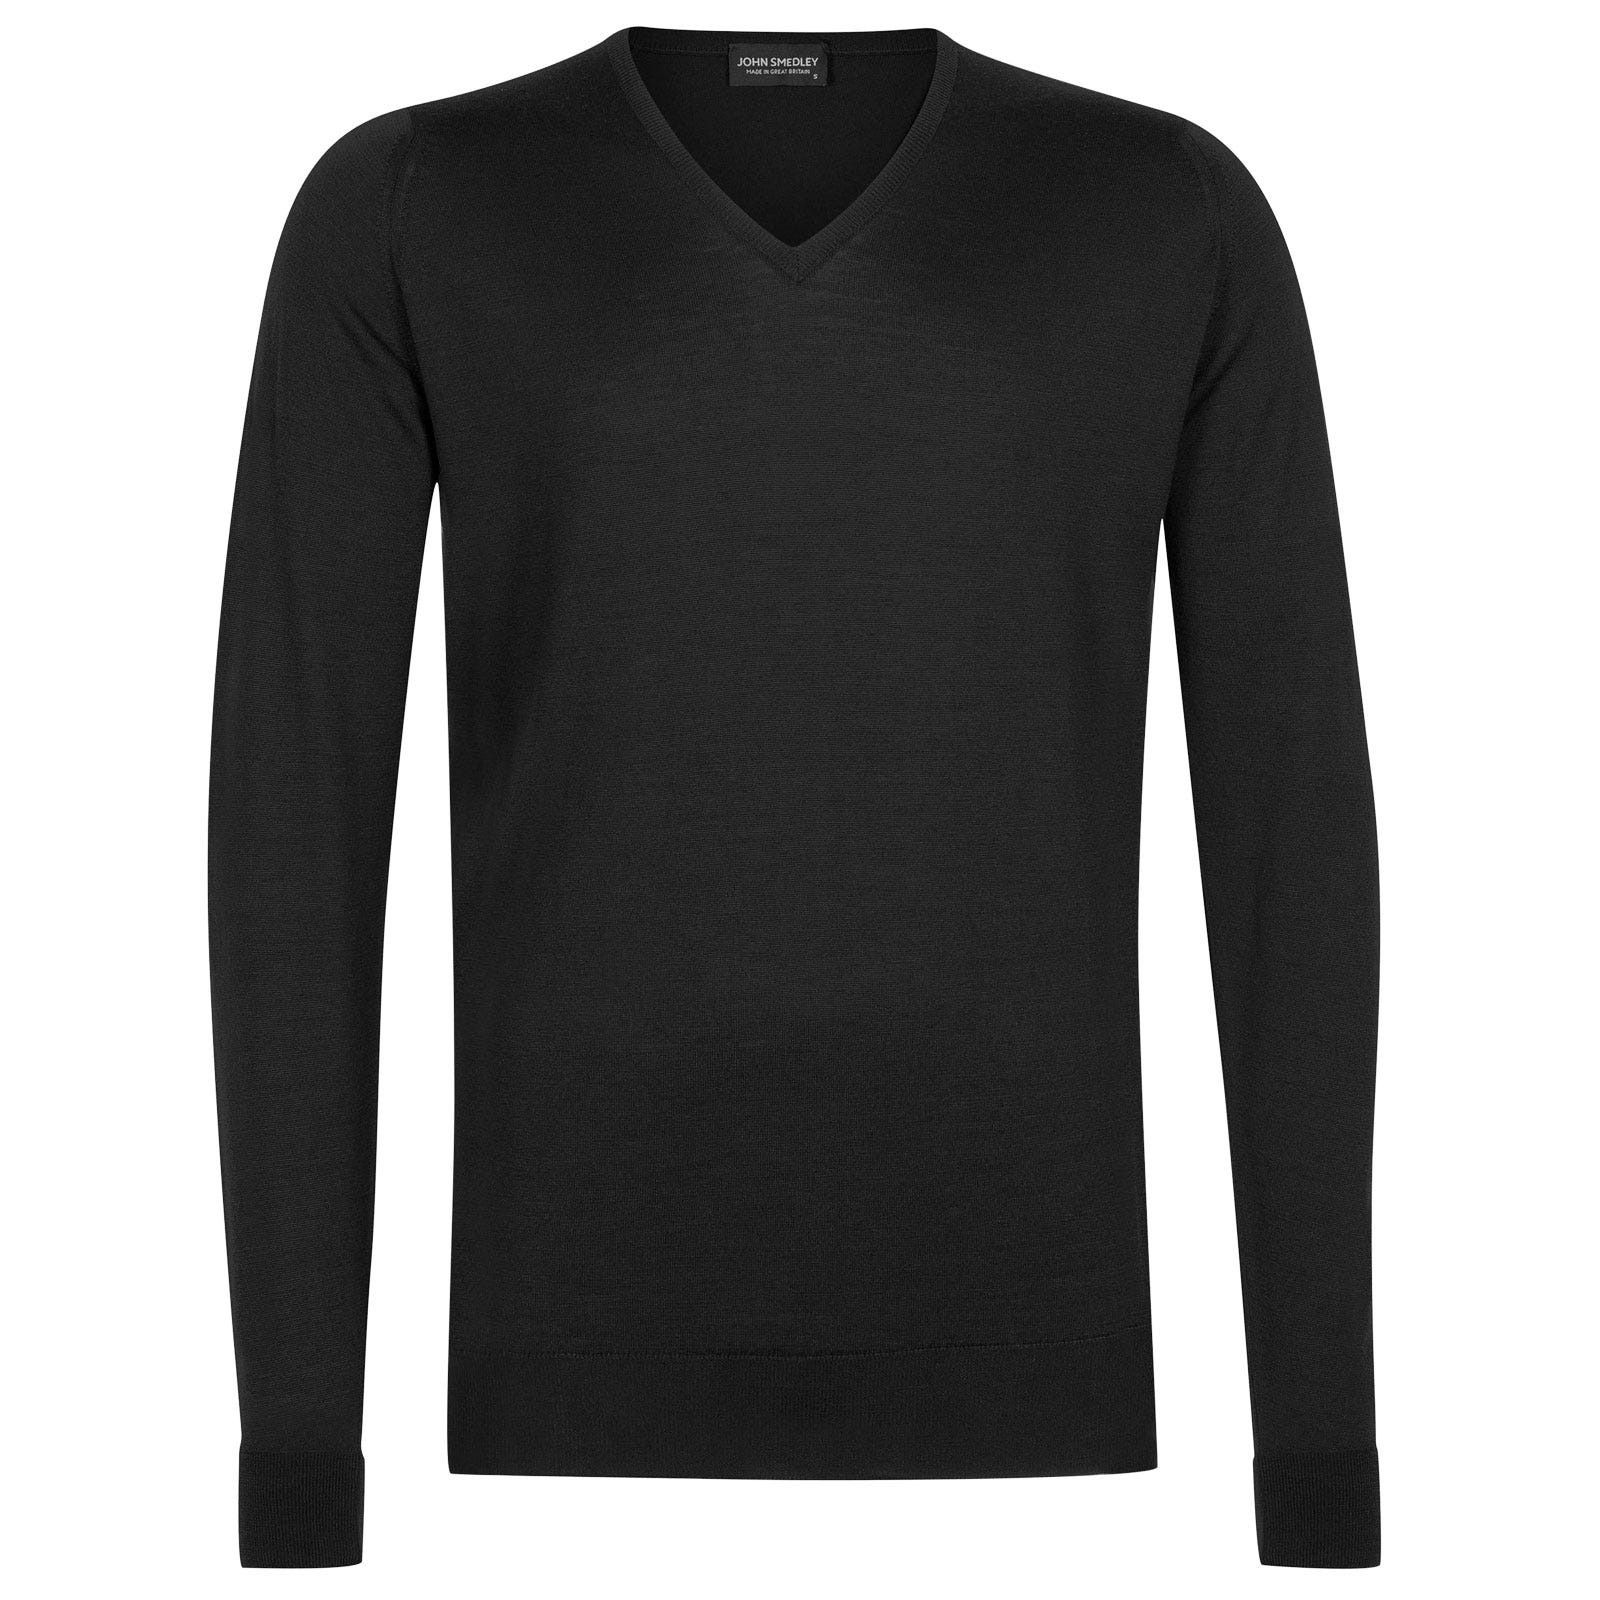 John Smedley bobby Merino Wool Pullover in Black-XS